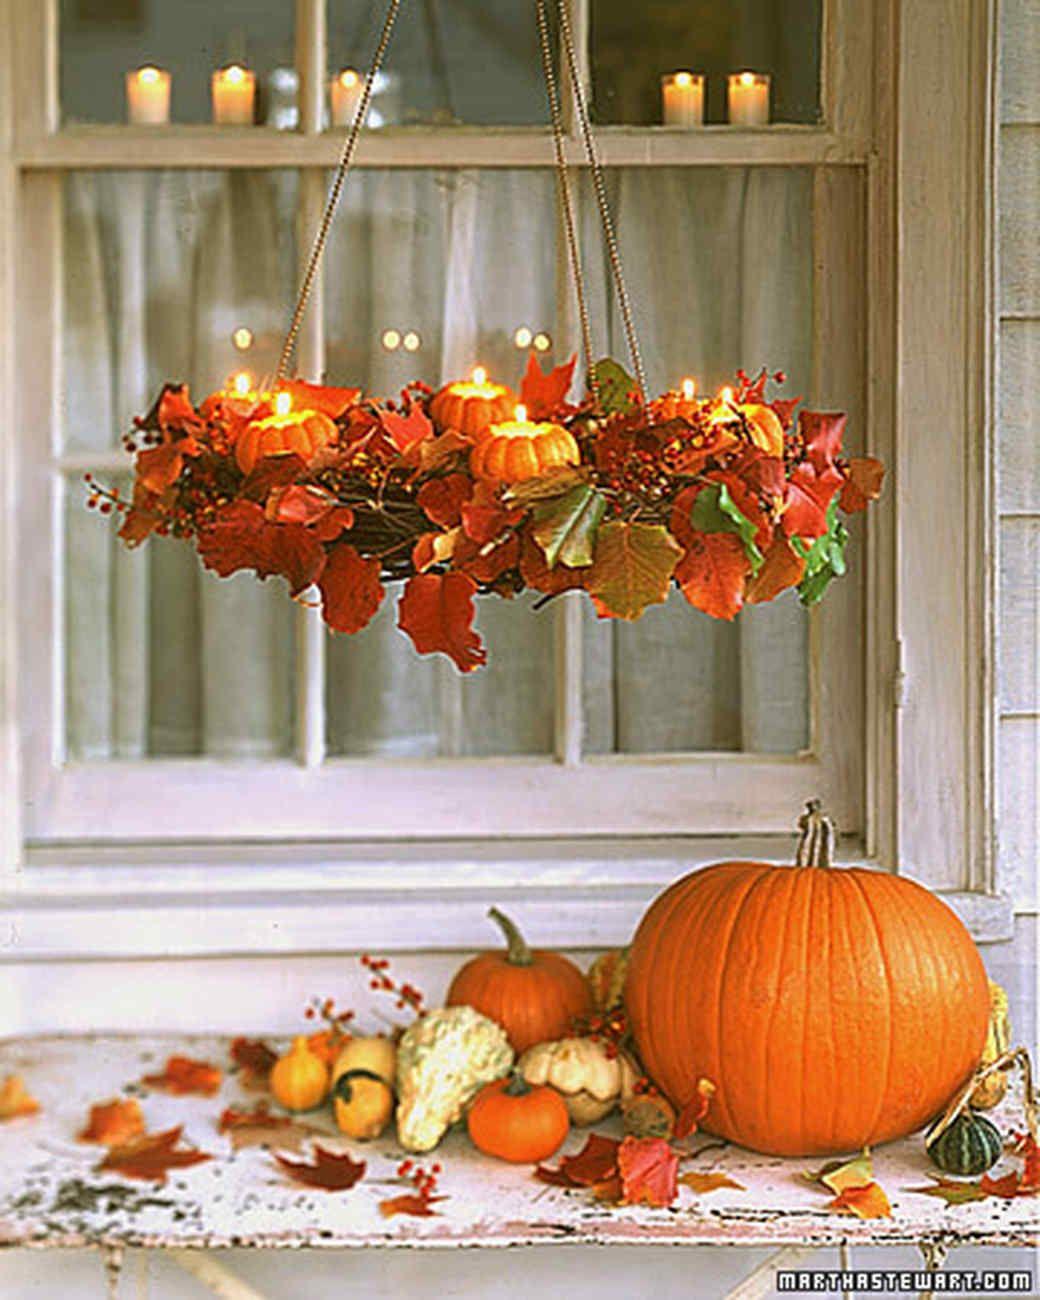 Pumpkin Wreath Chandelier Fall Outdoor Decor Halloween Outdoor Decorations Creative Pumpkin Decorating